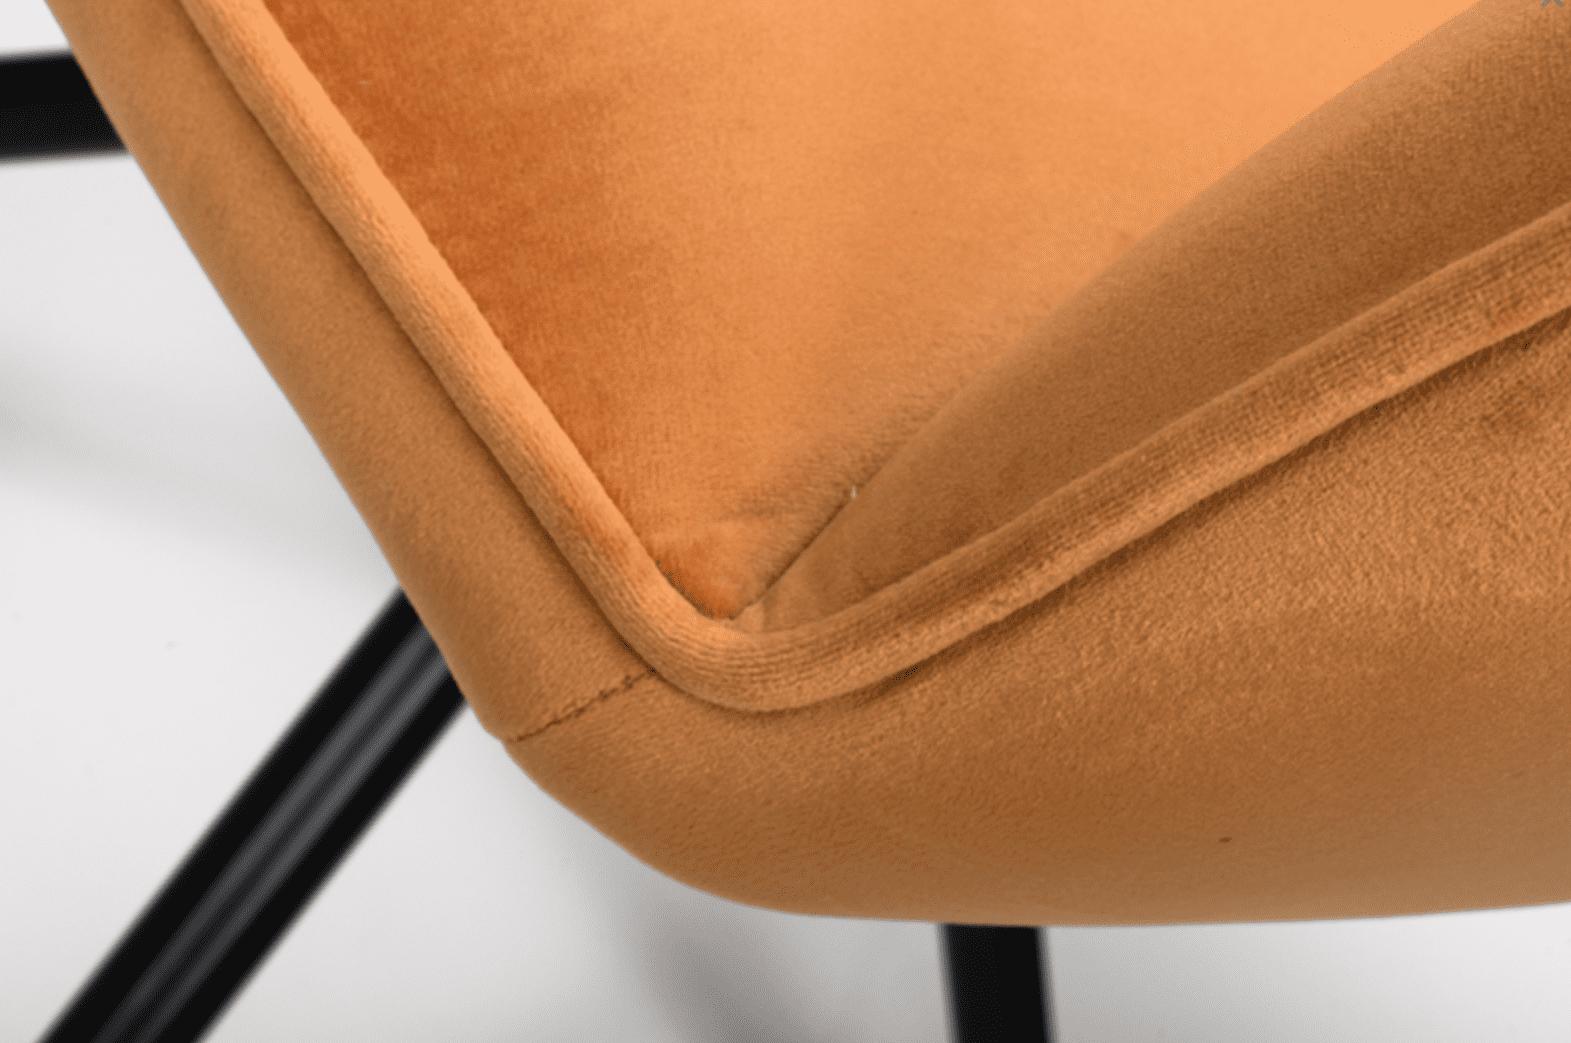 UNO chairs burnt orange seat